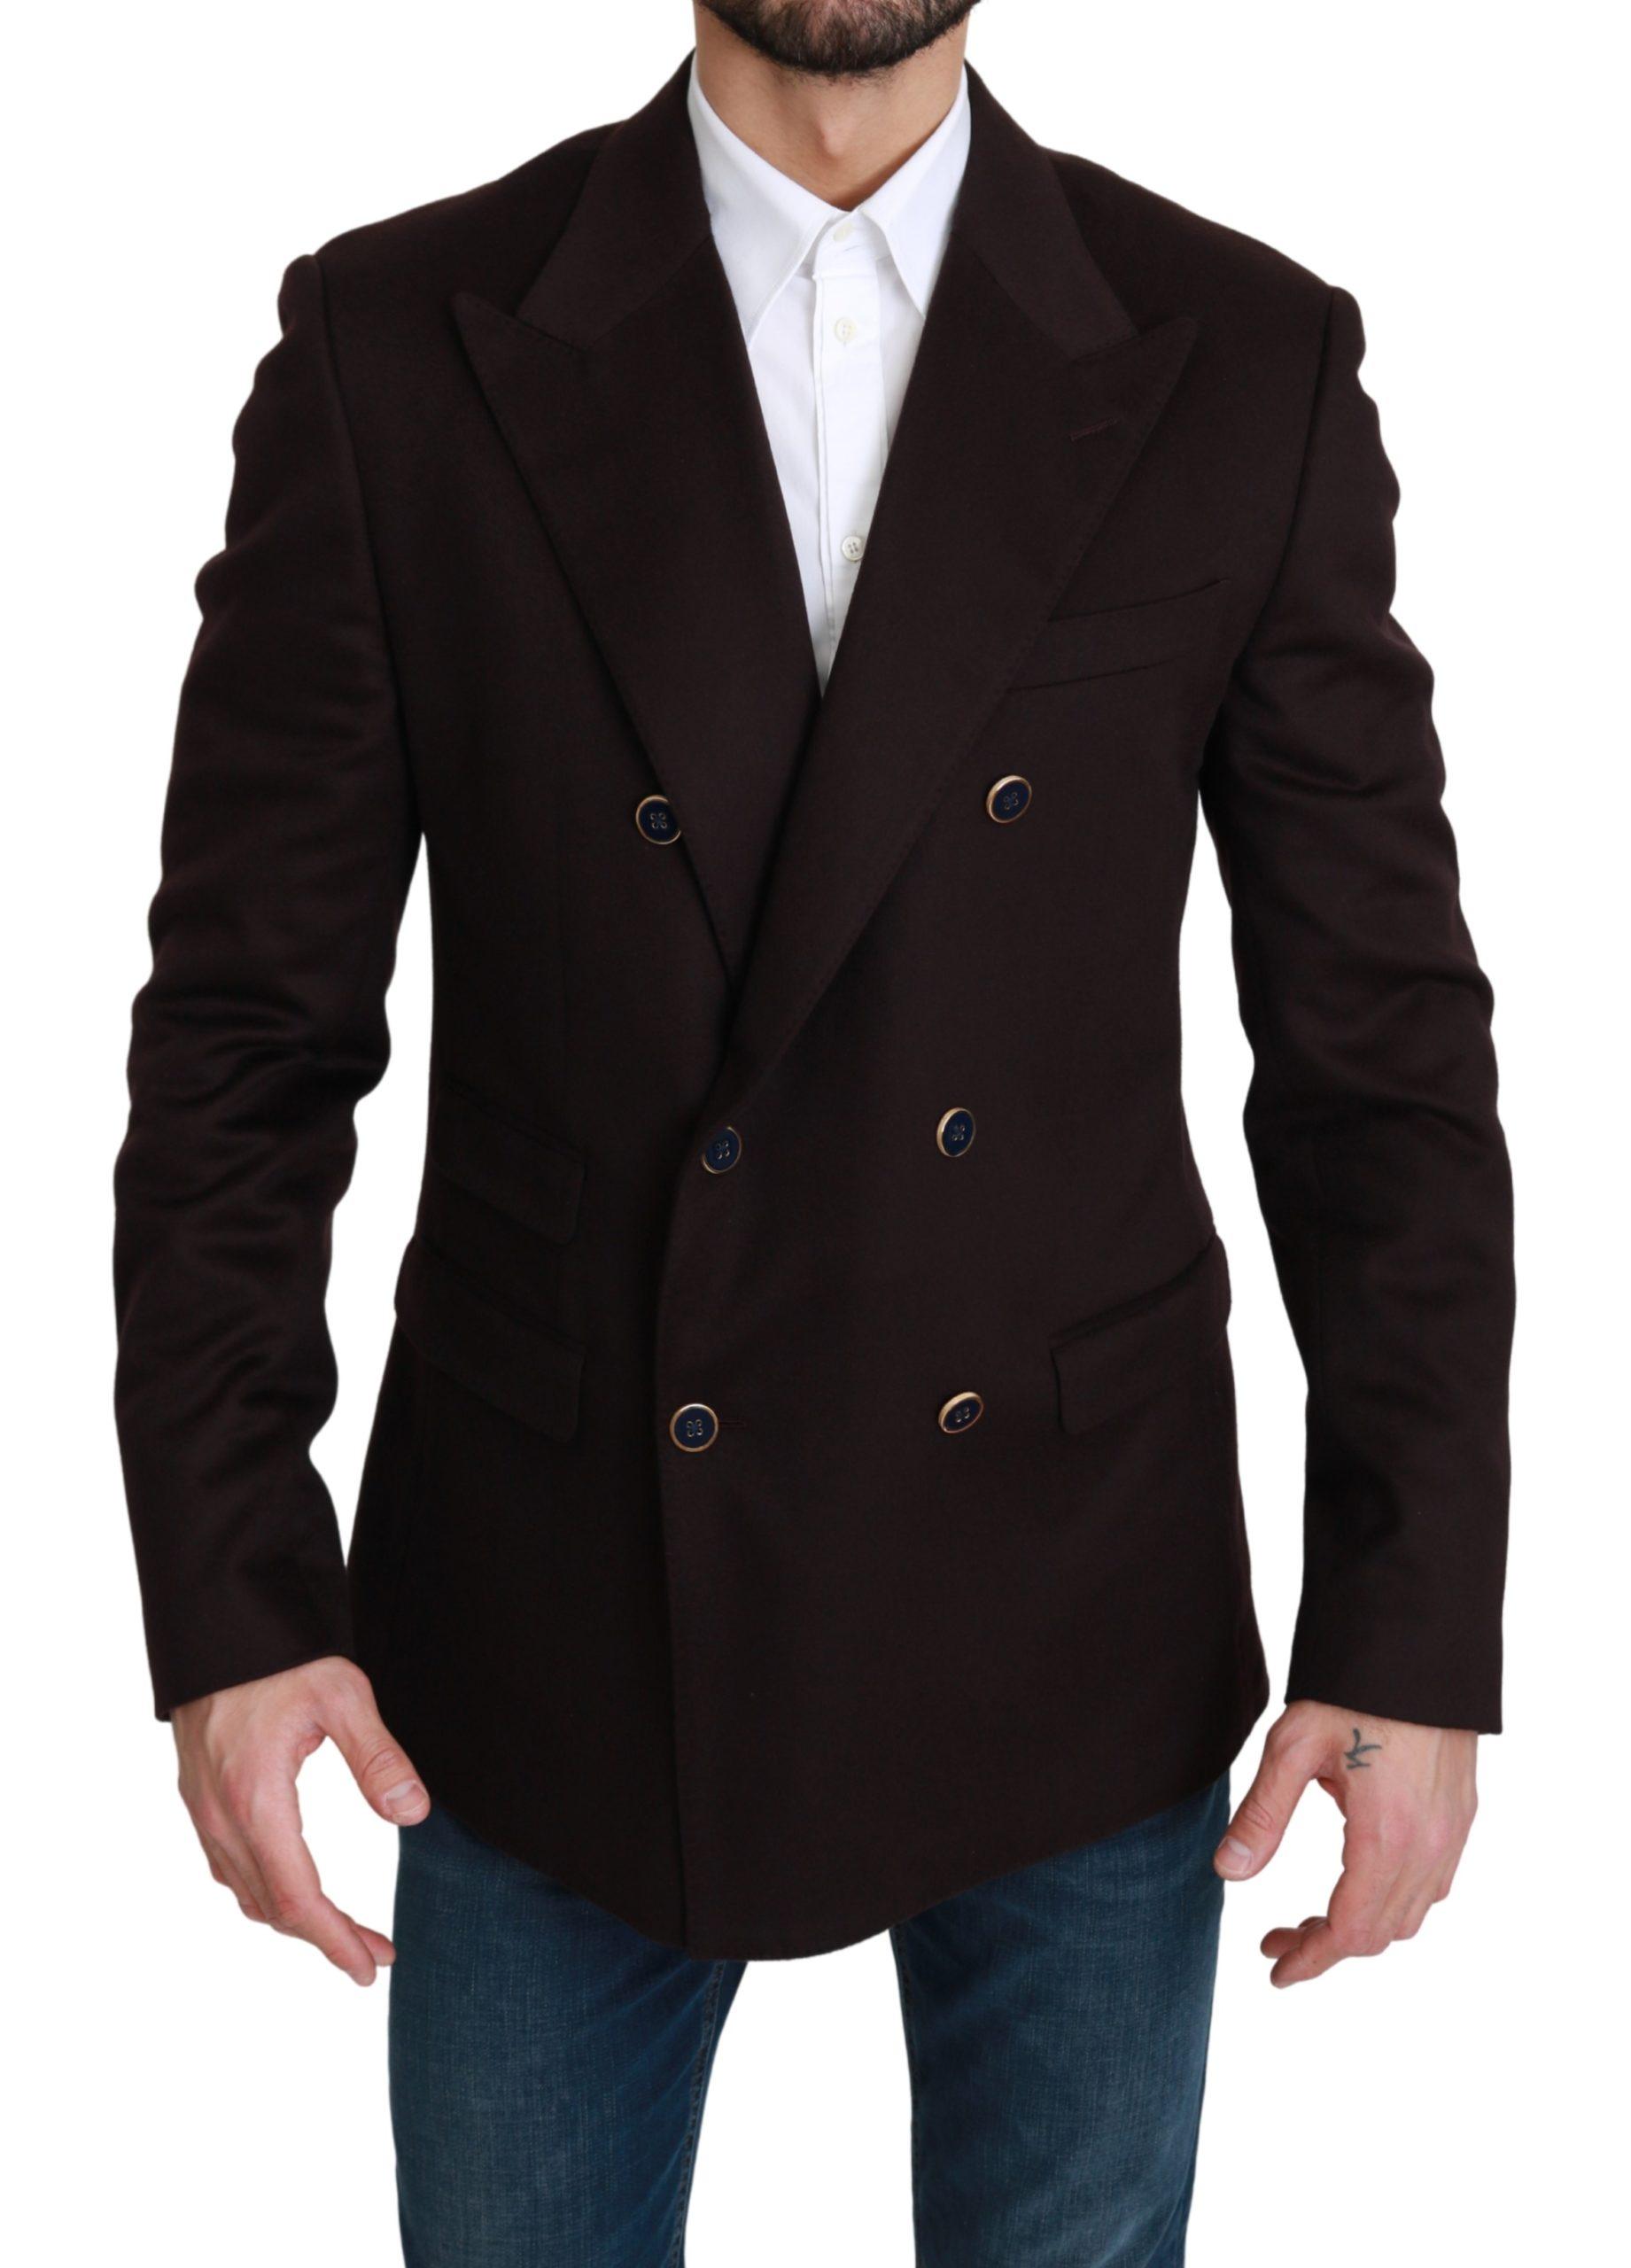 Dolce & Gabbana Men's Double Breasted TAORMINA Blazer Bordeaux KOS1751 - IT52 | XL